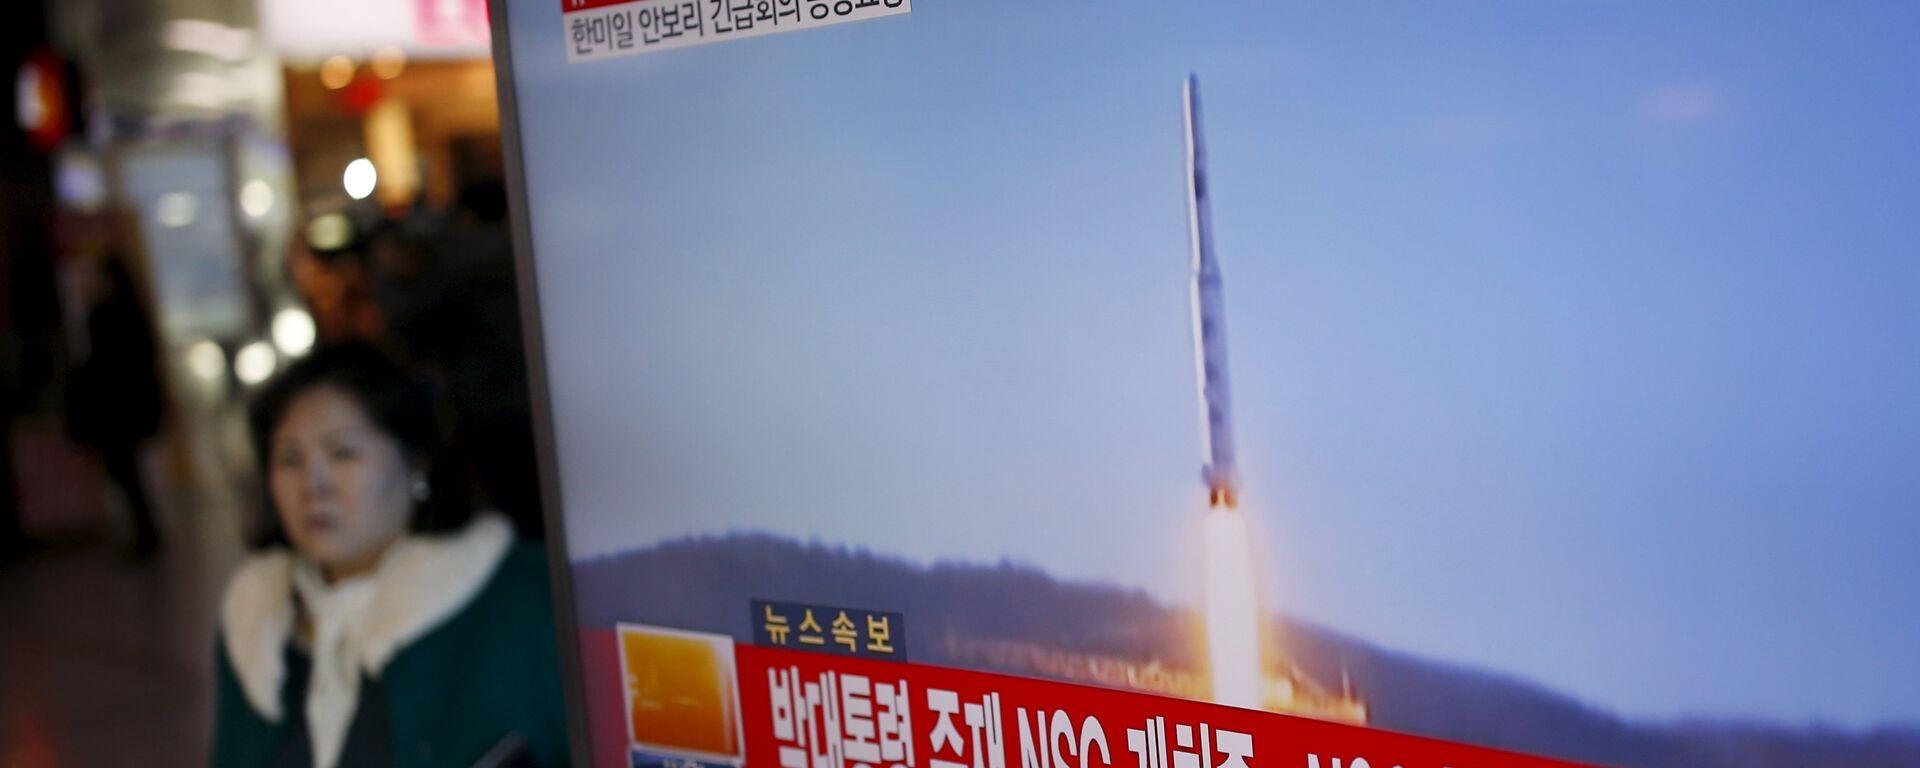 Corea del Norte lanza un misil de largo alcance - Sputnik Mundo, 1920, 24.03.2021